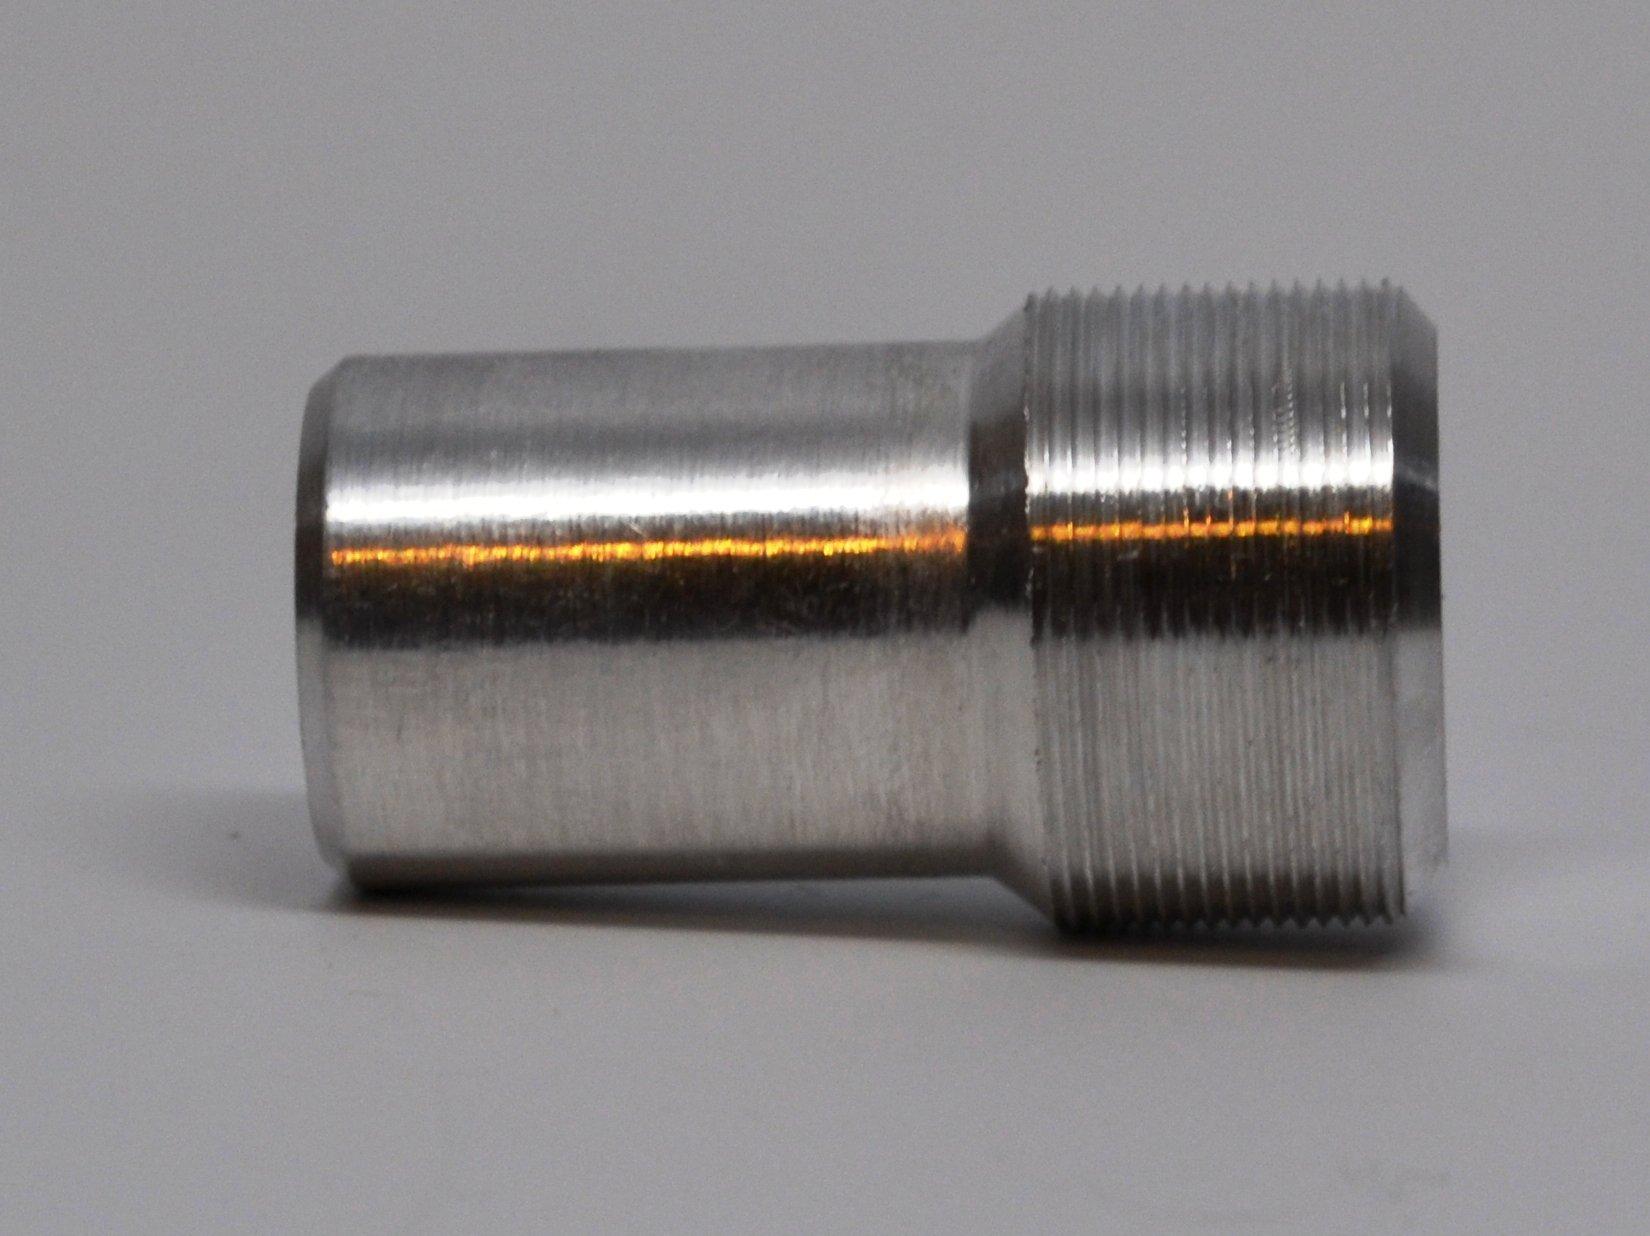 22mm x 0.75 Threading Alignment Tool (TAT) Die Starter for 12ga - Gunsmithing by NTC